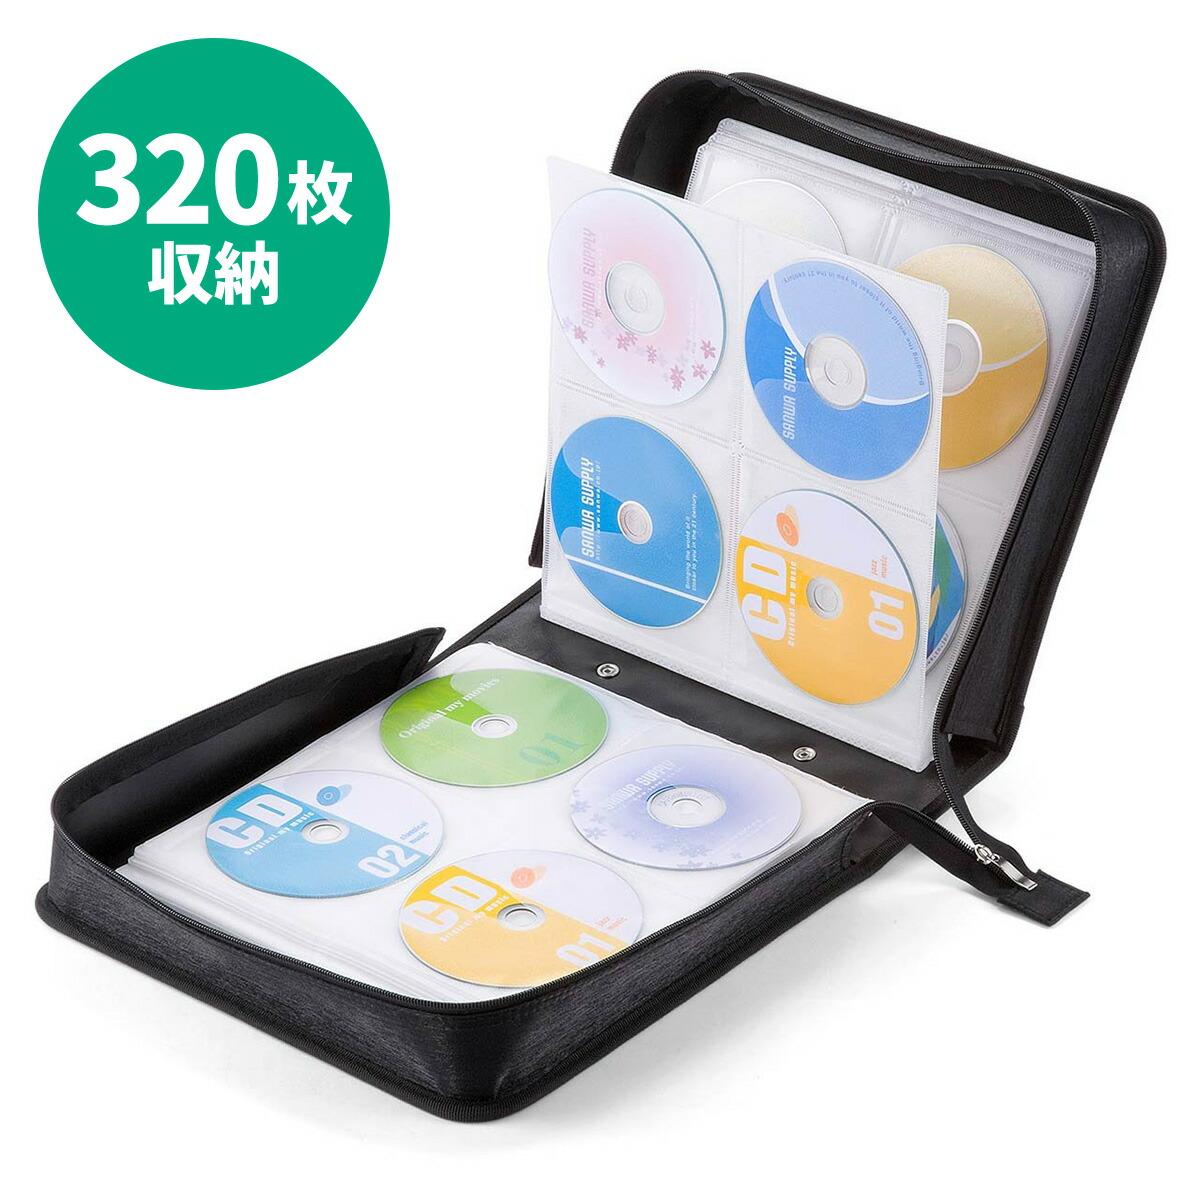 [200-FCD030]【サンワダイレクト限定品】 CDケース DVDケース 持ち運び キャリングケース 320枚収納 ファイル型 収納ケース メディアケース